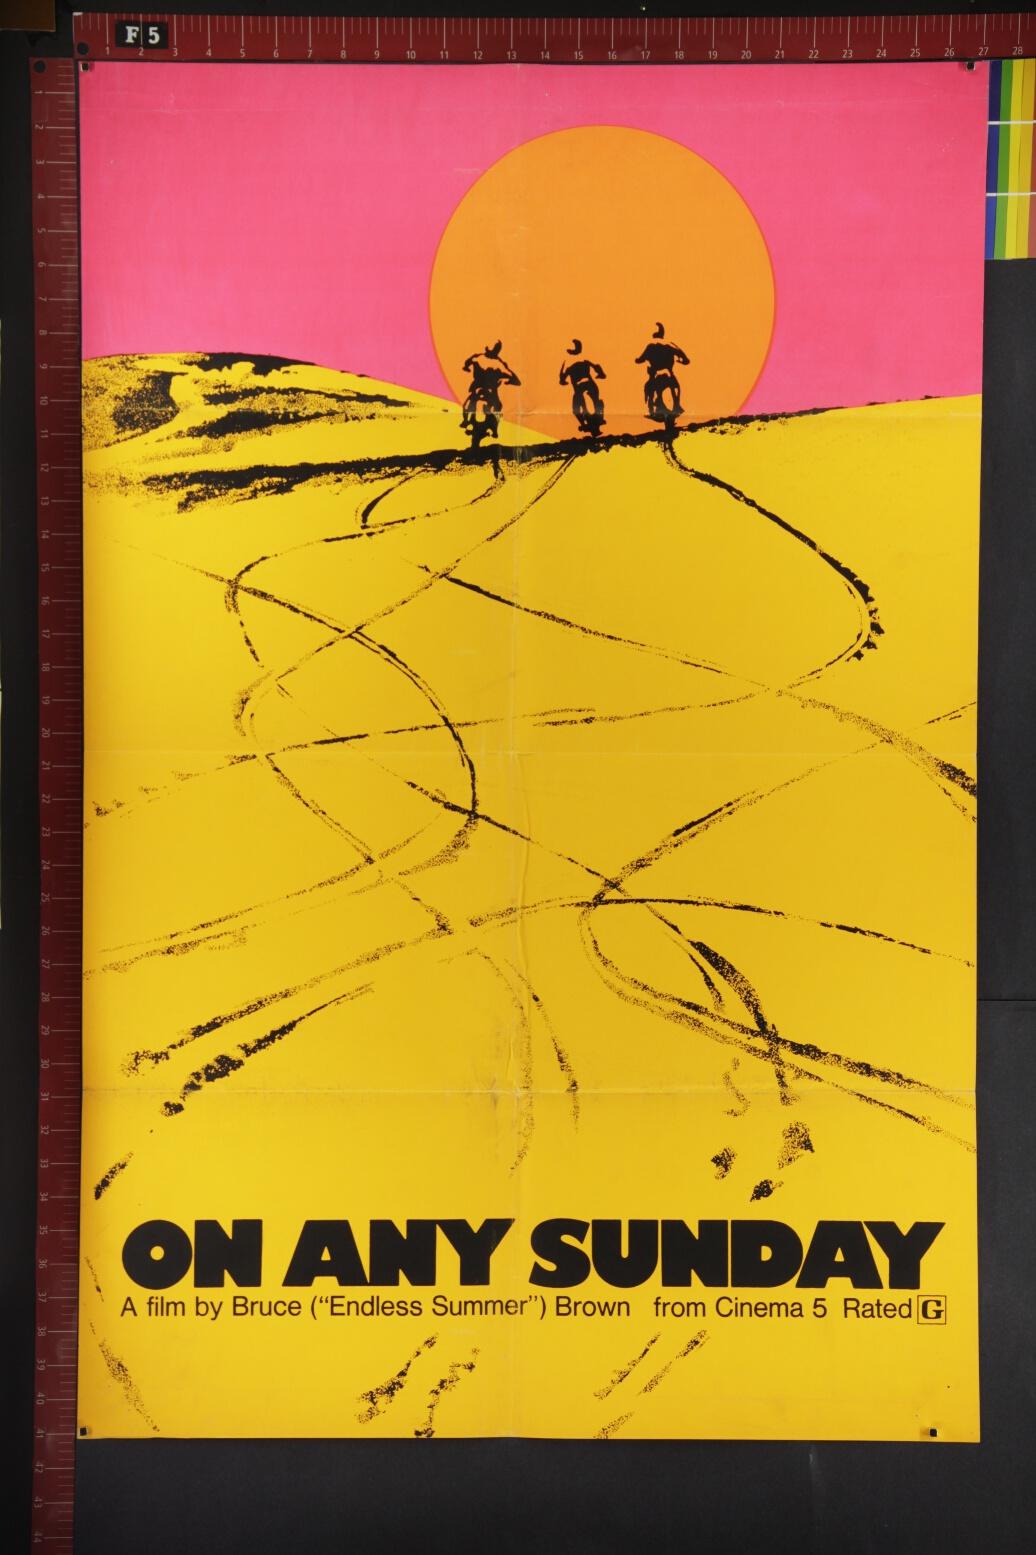 on-any-sunday-arthouse-documentary-sports-rare-original-movie-poster